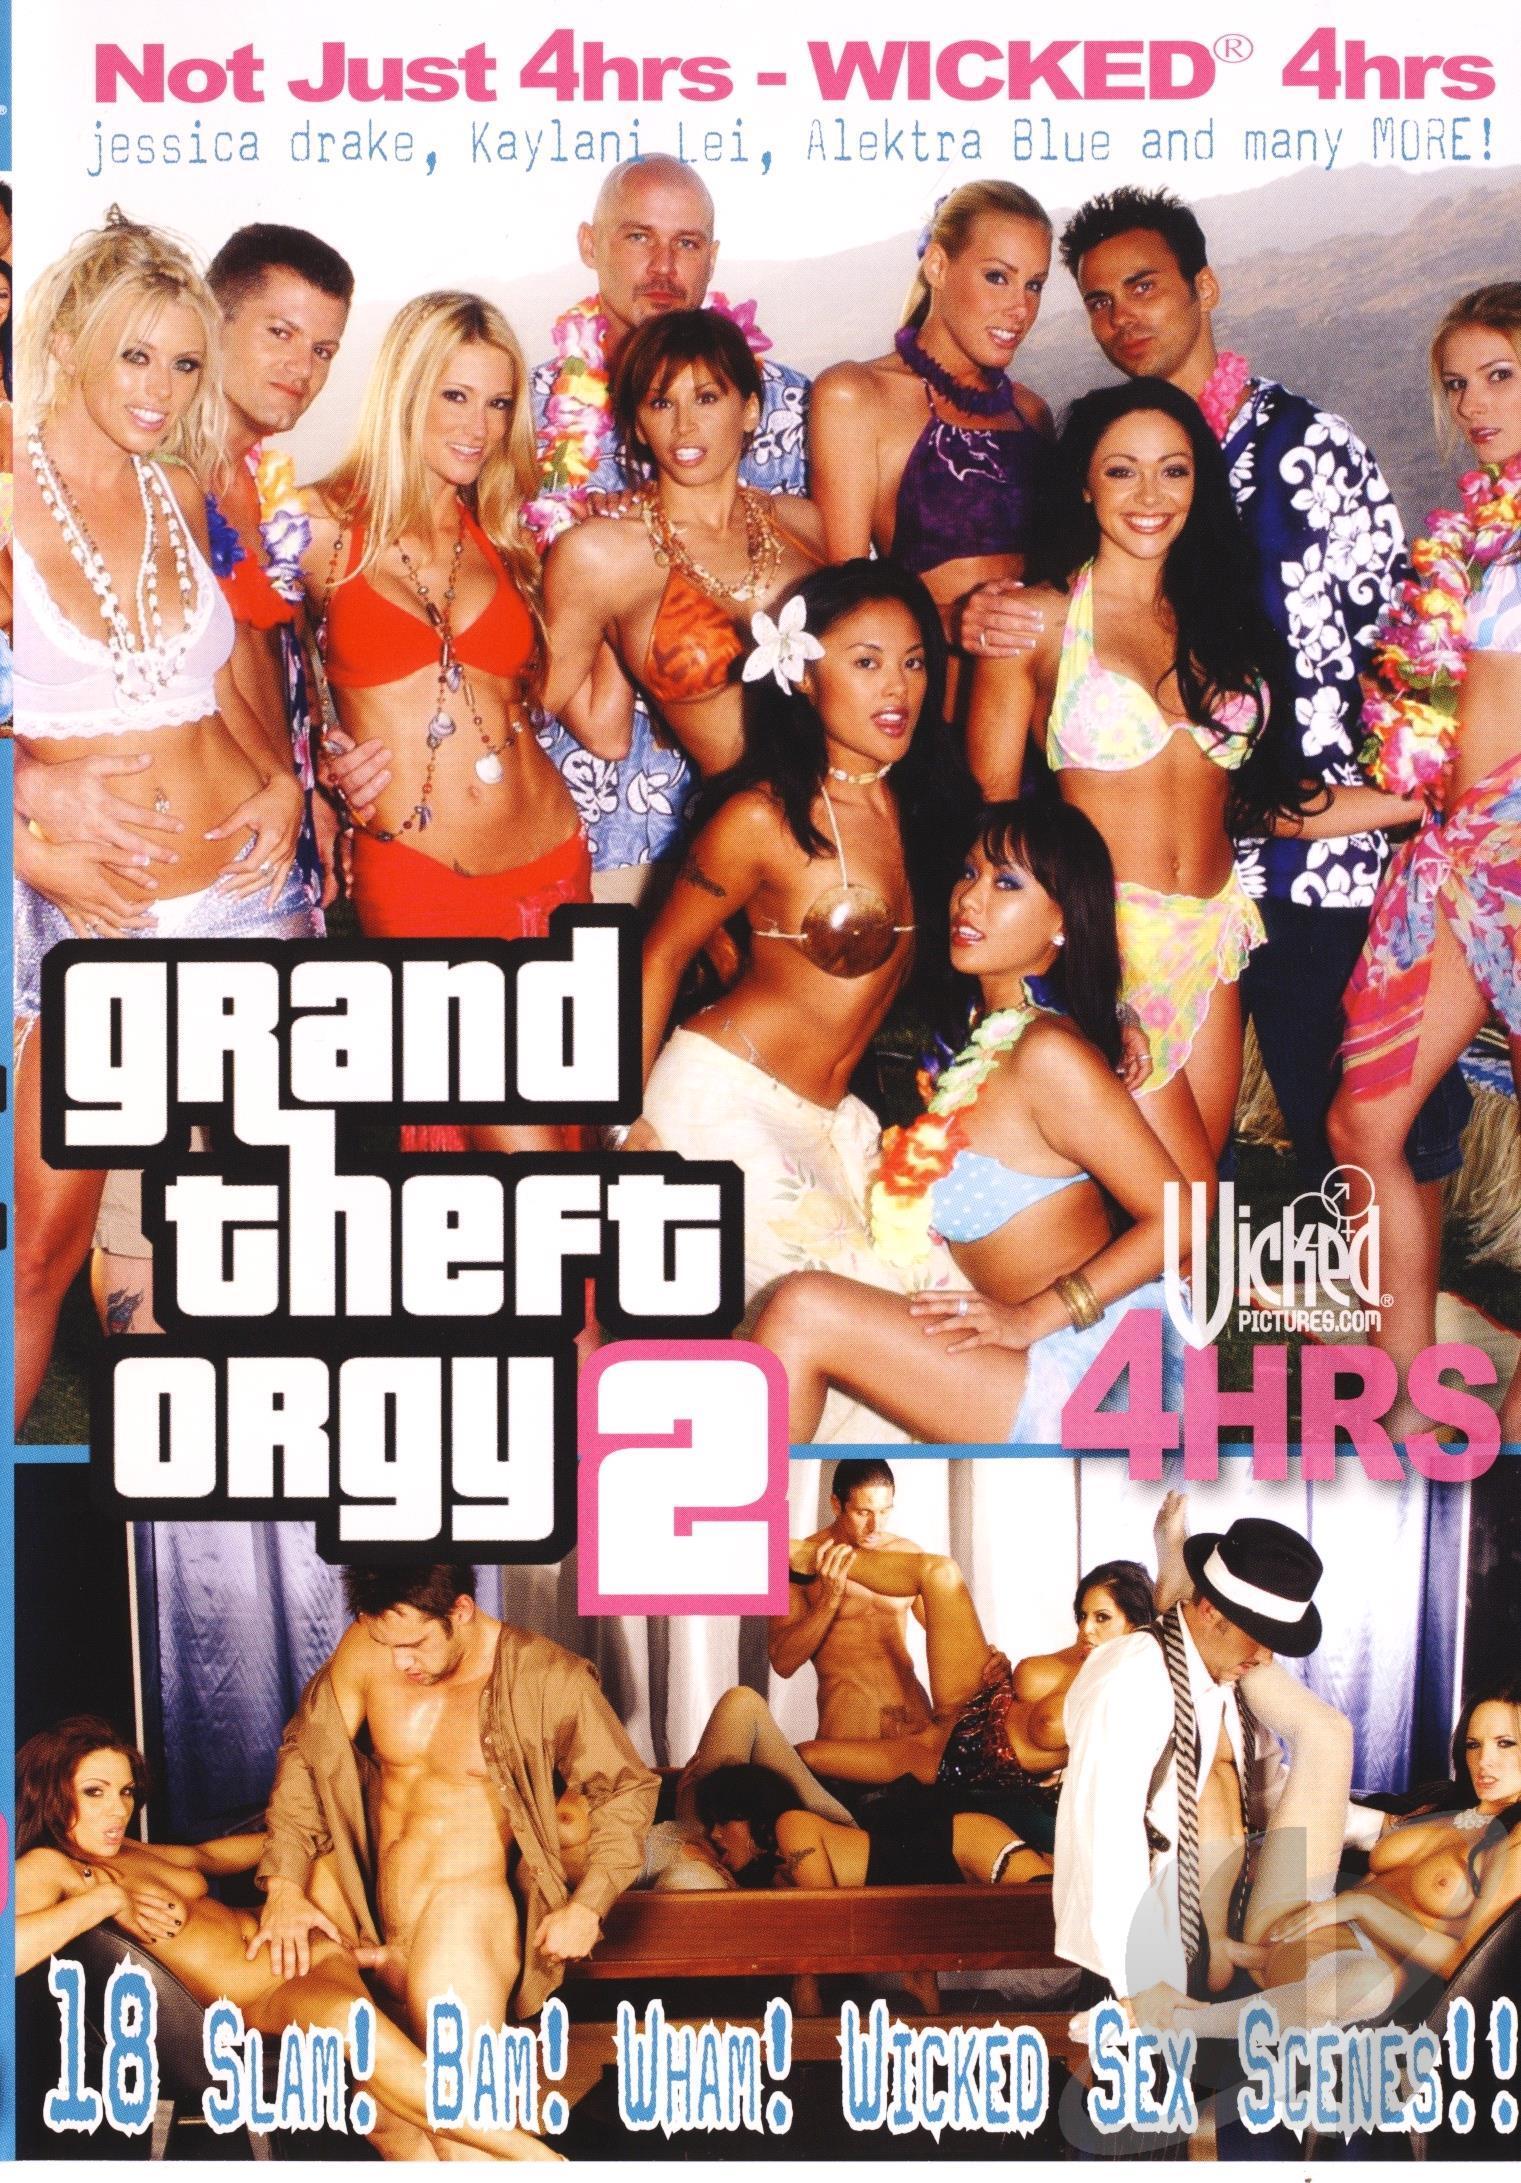 Grand Theft Orgy 2 XXX DVDRip x264-DigitalSin